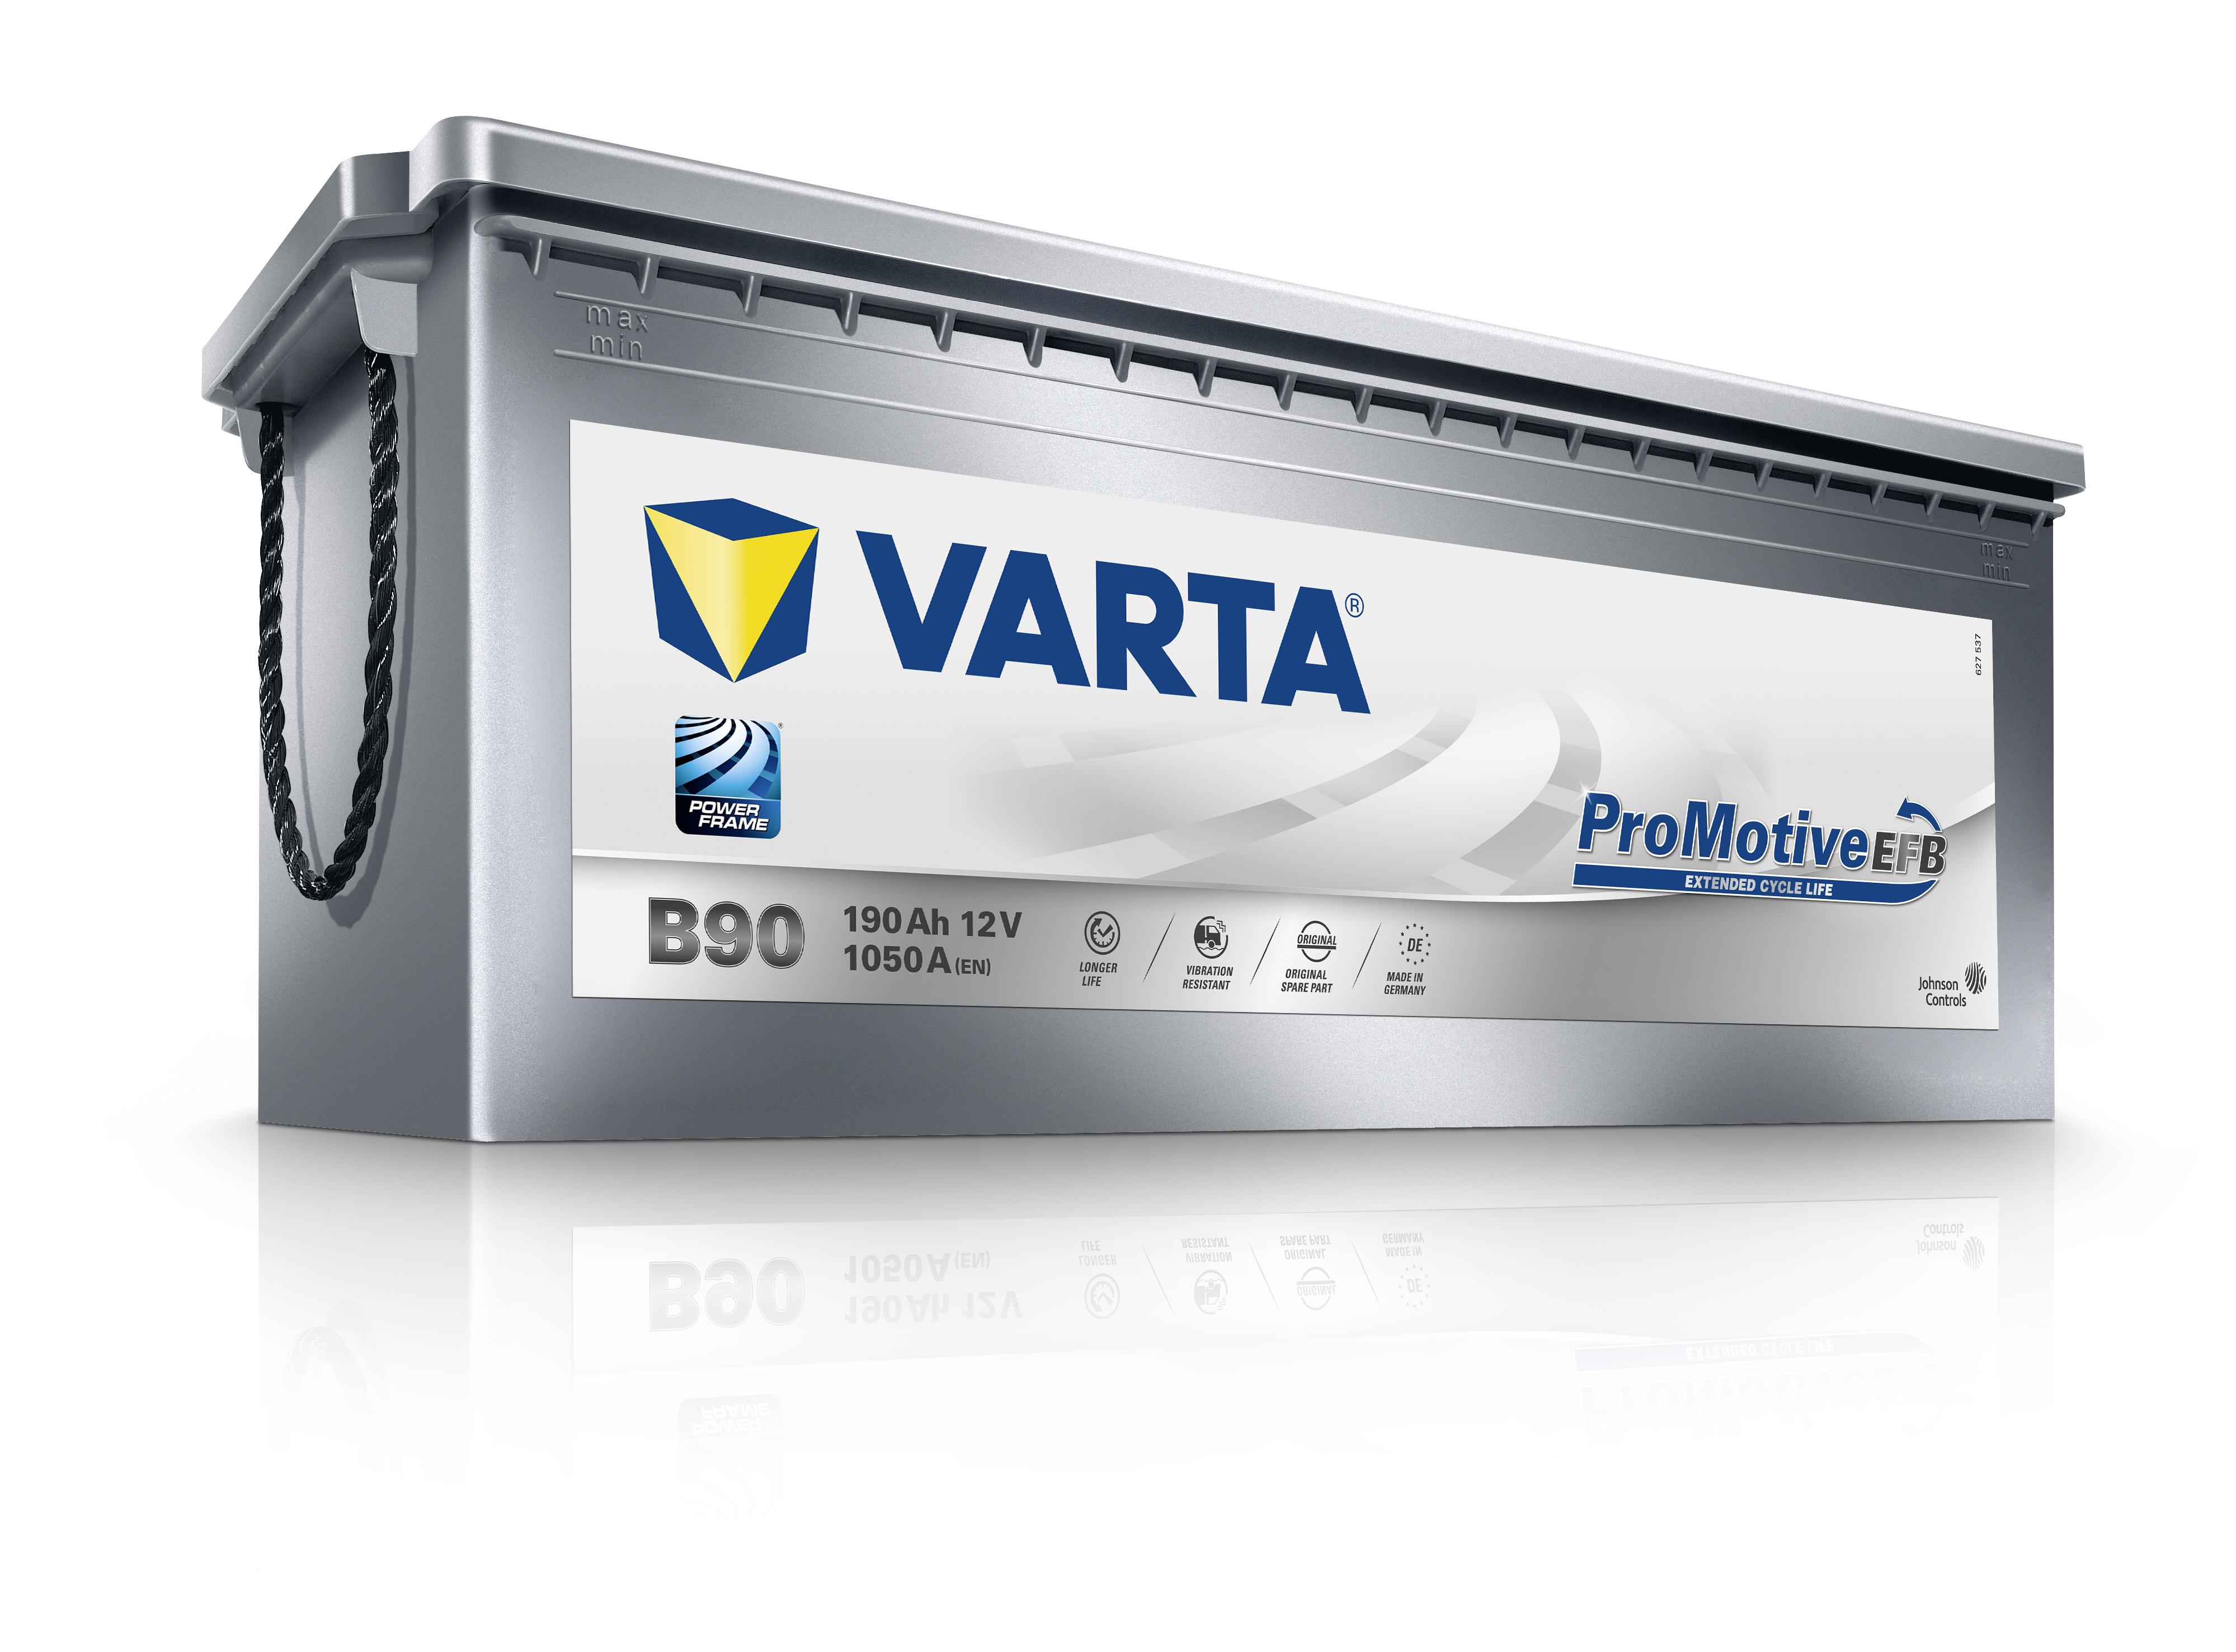 VARTA Varta Promotive Silver EFB - 12v 190ah - teherautó akkumulátor